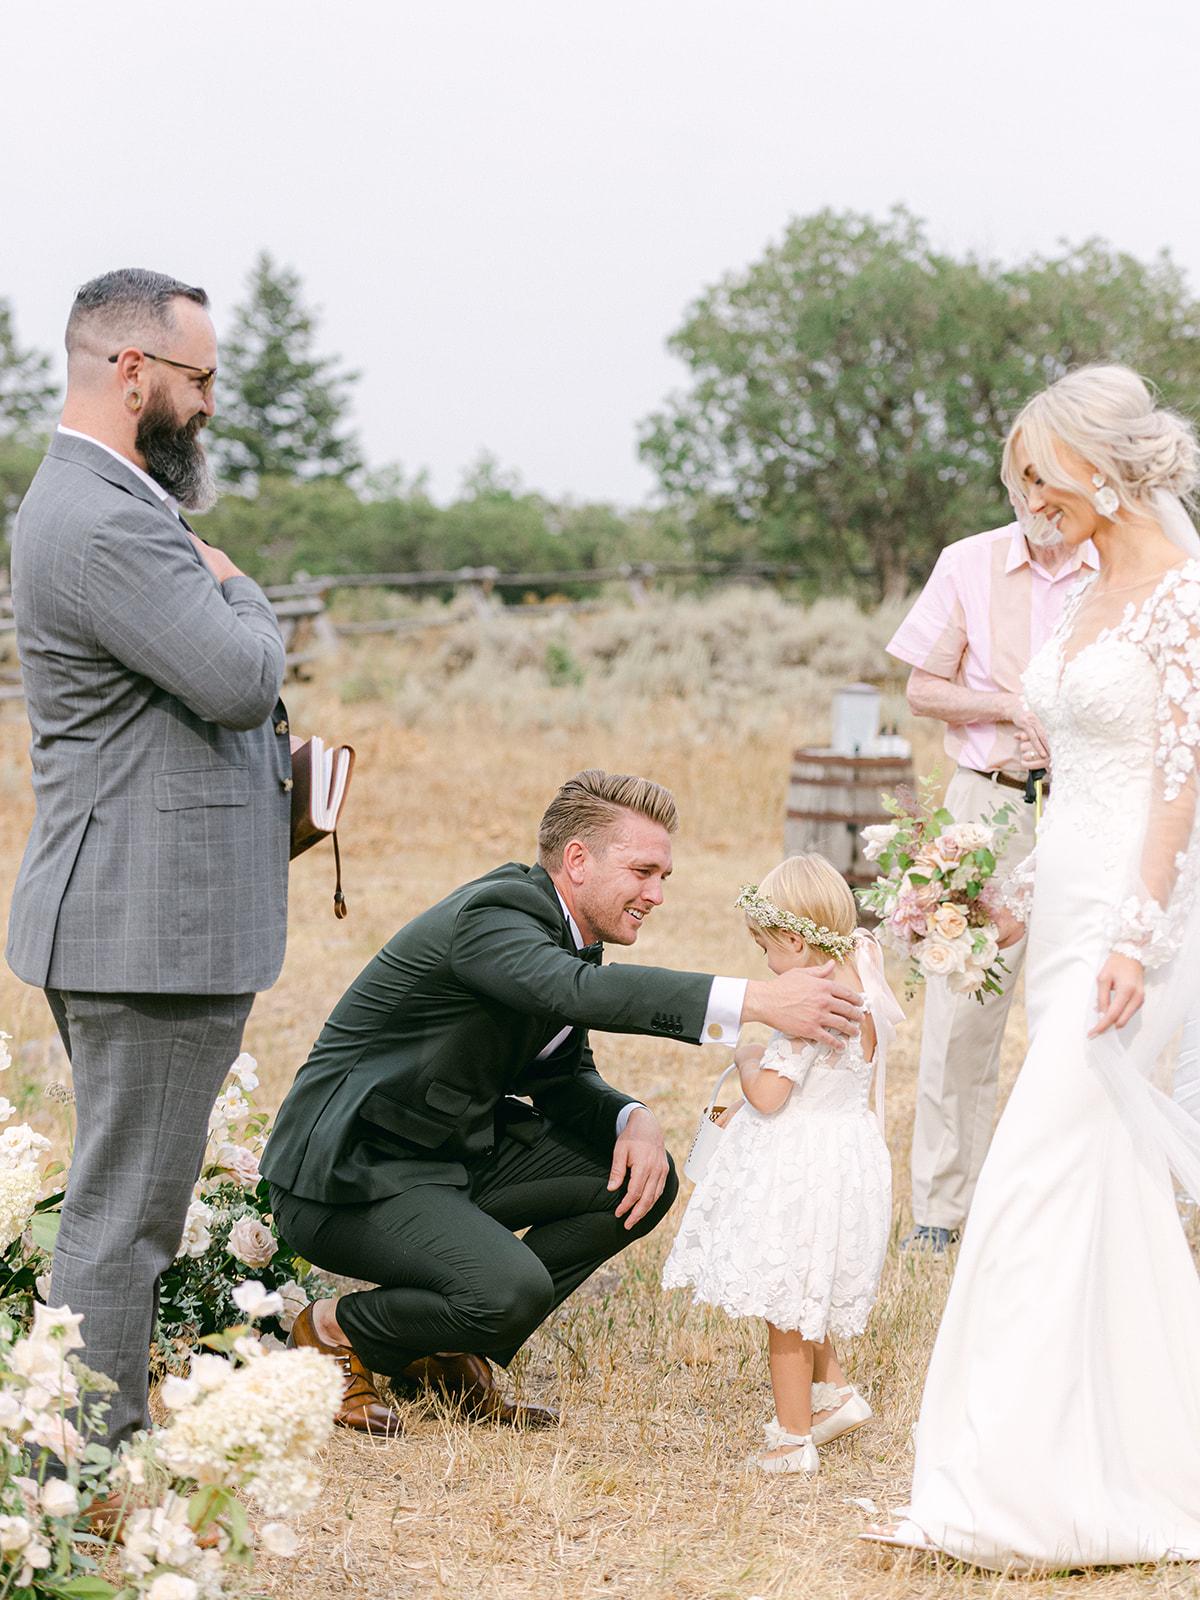 Groom Hugging Bride's Daughter During Intimate Wedding Ceremony